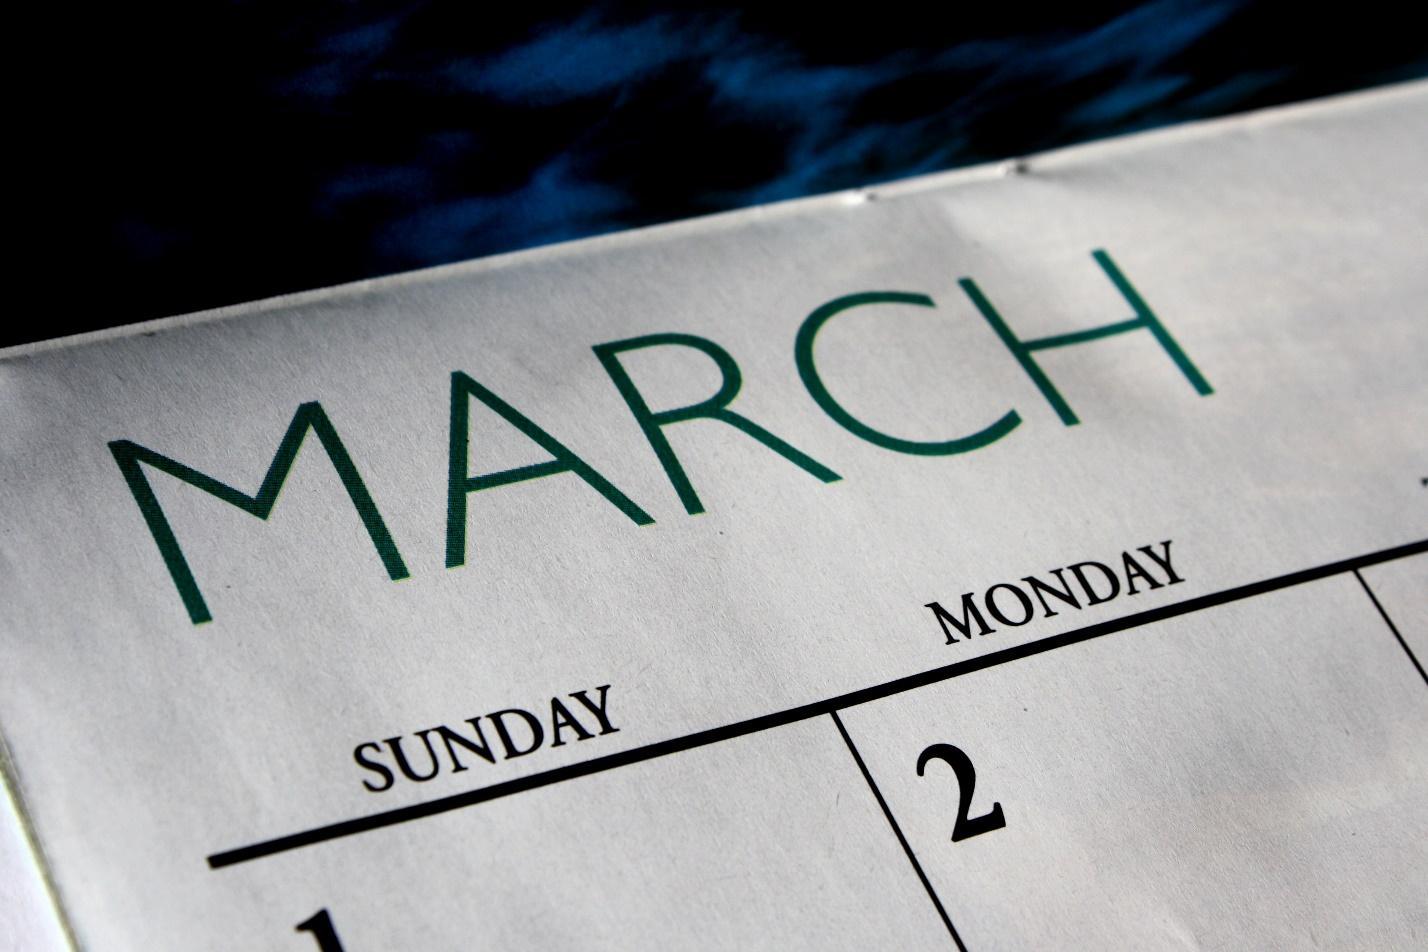 S:\ServerPictures\Pictures - Priscilla\march-calendar.jpg